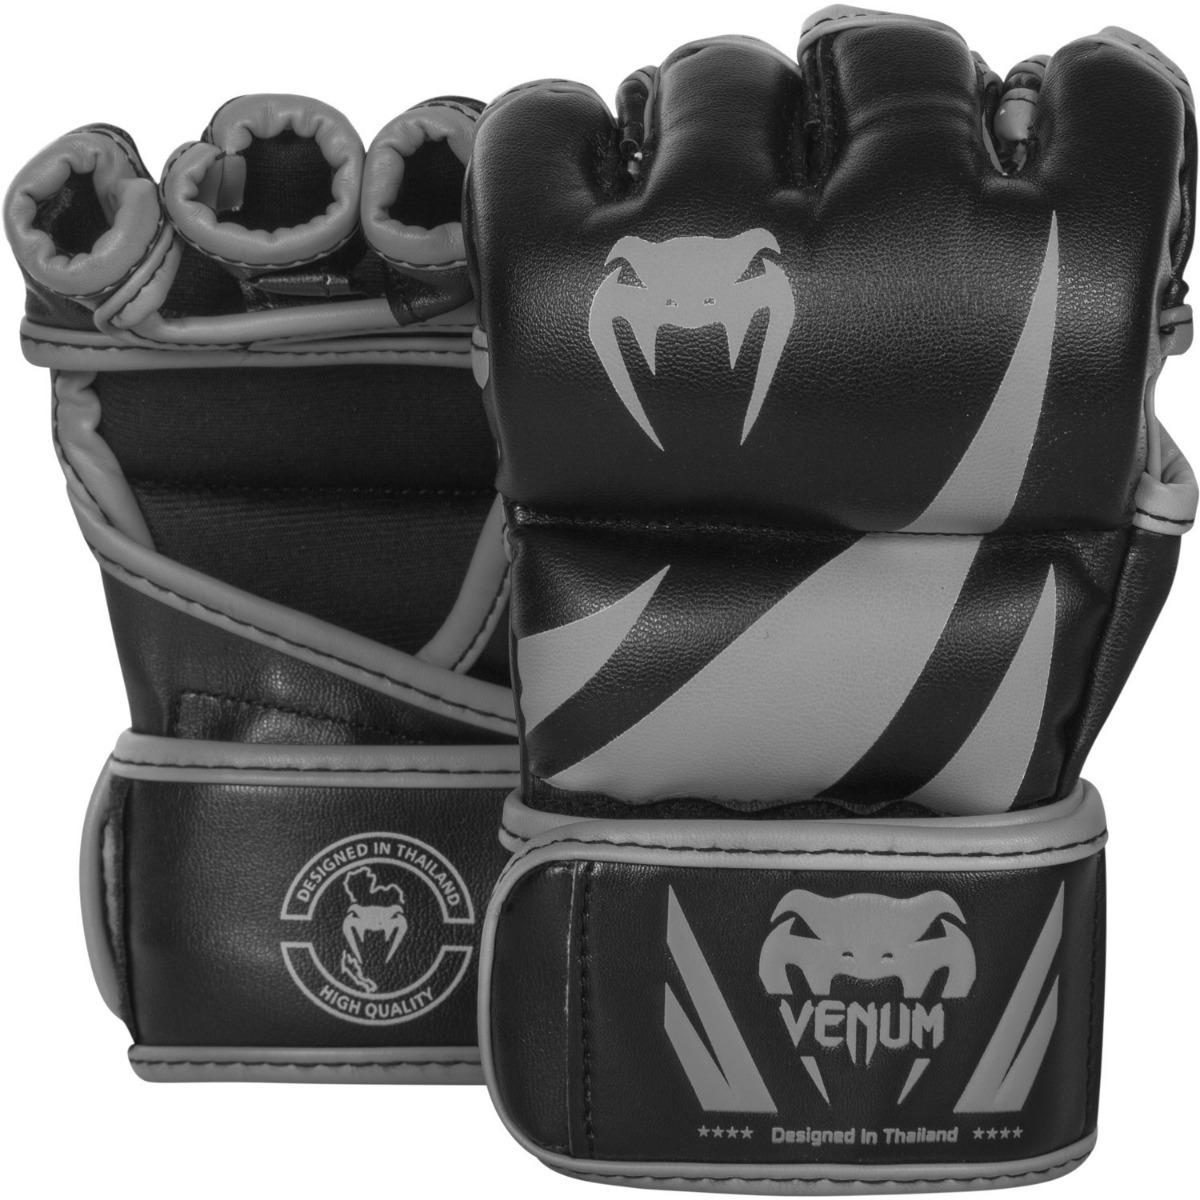 Todo Negro Boxing, Martial Arts & Mma Other Combat Sport Supplies Venum Challenger Mma Guantes